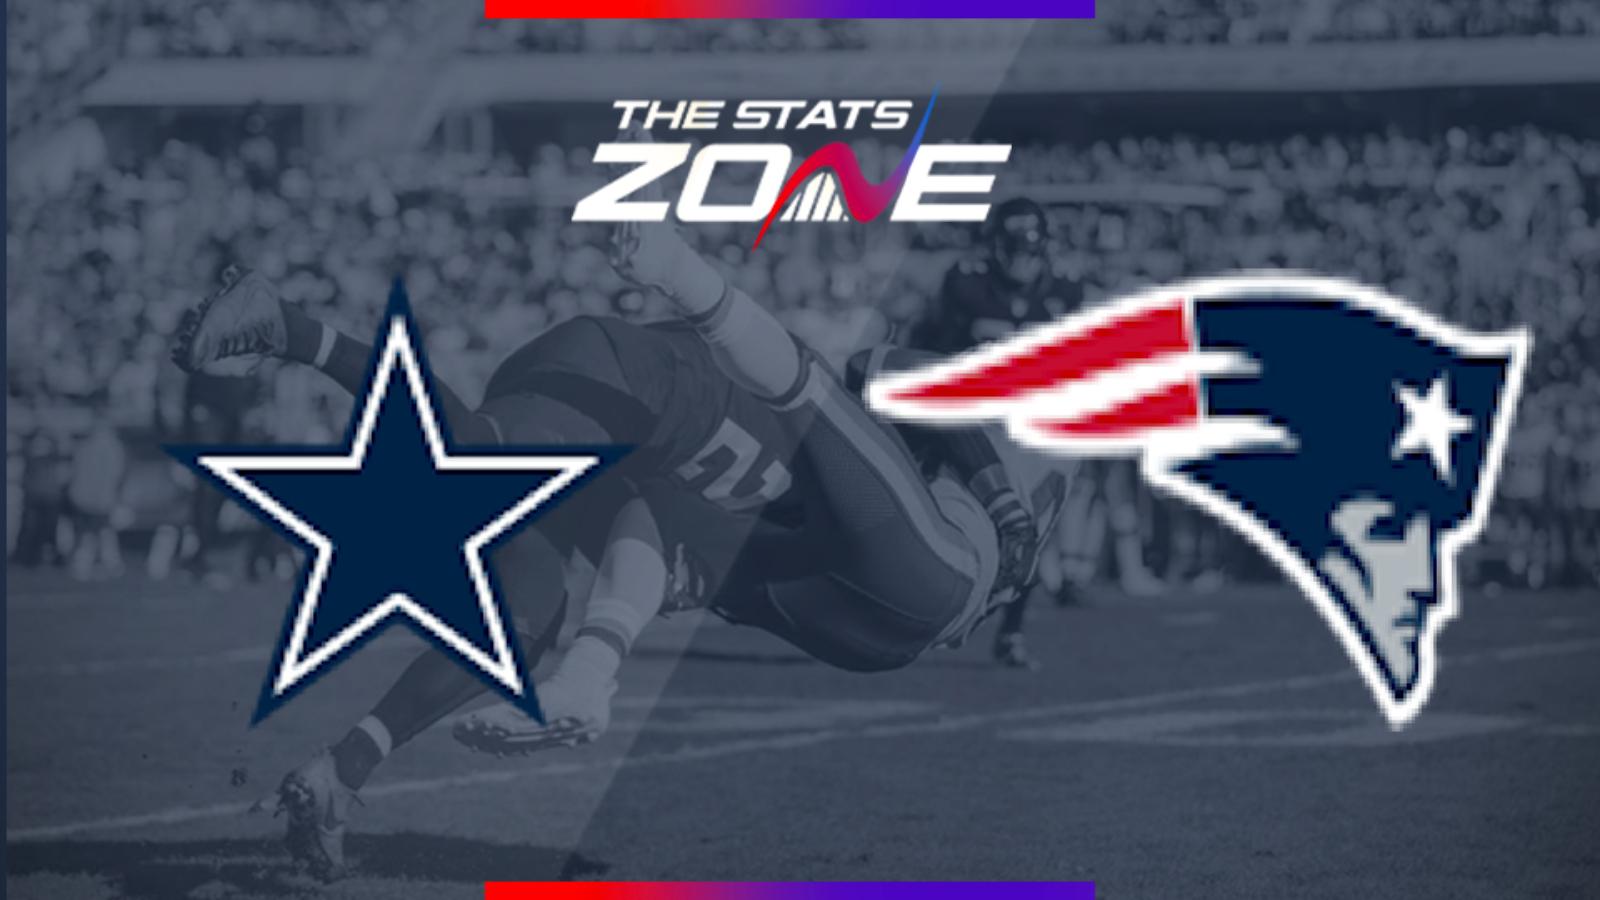 2019 Nfl Dallas Cowboys New England Patriots Preview